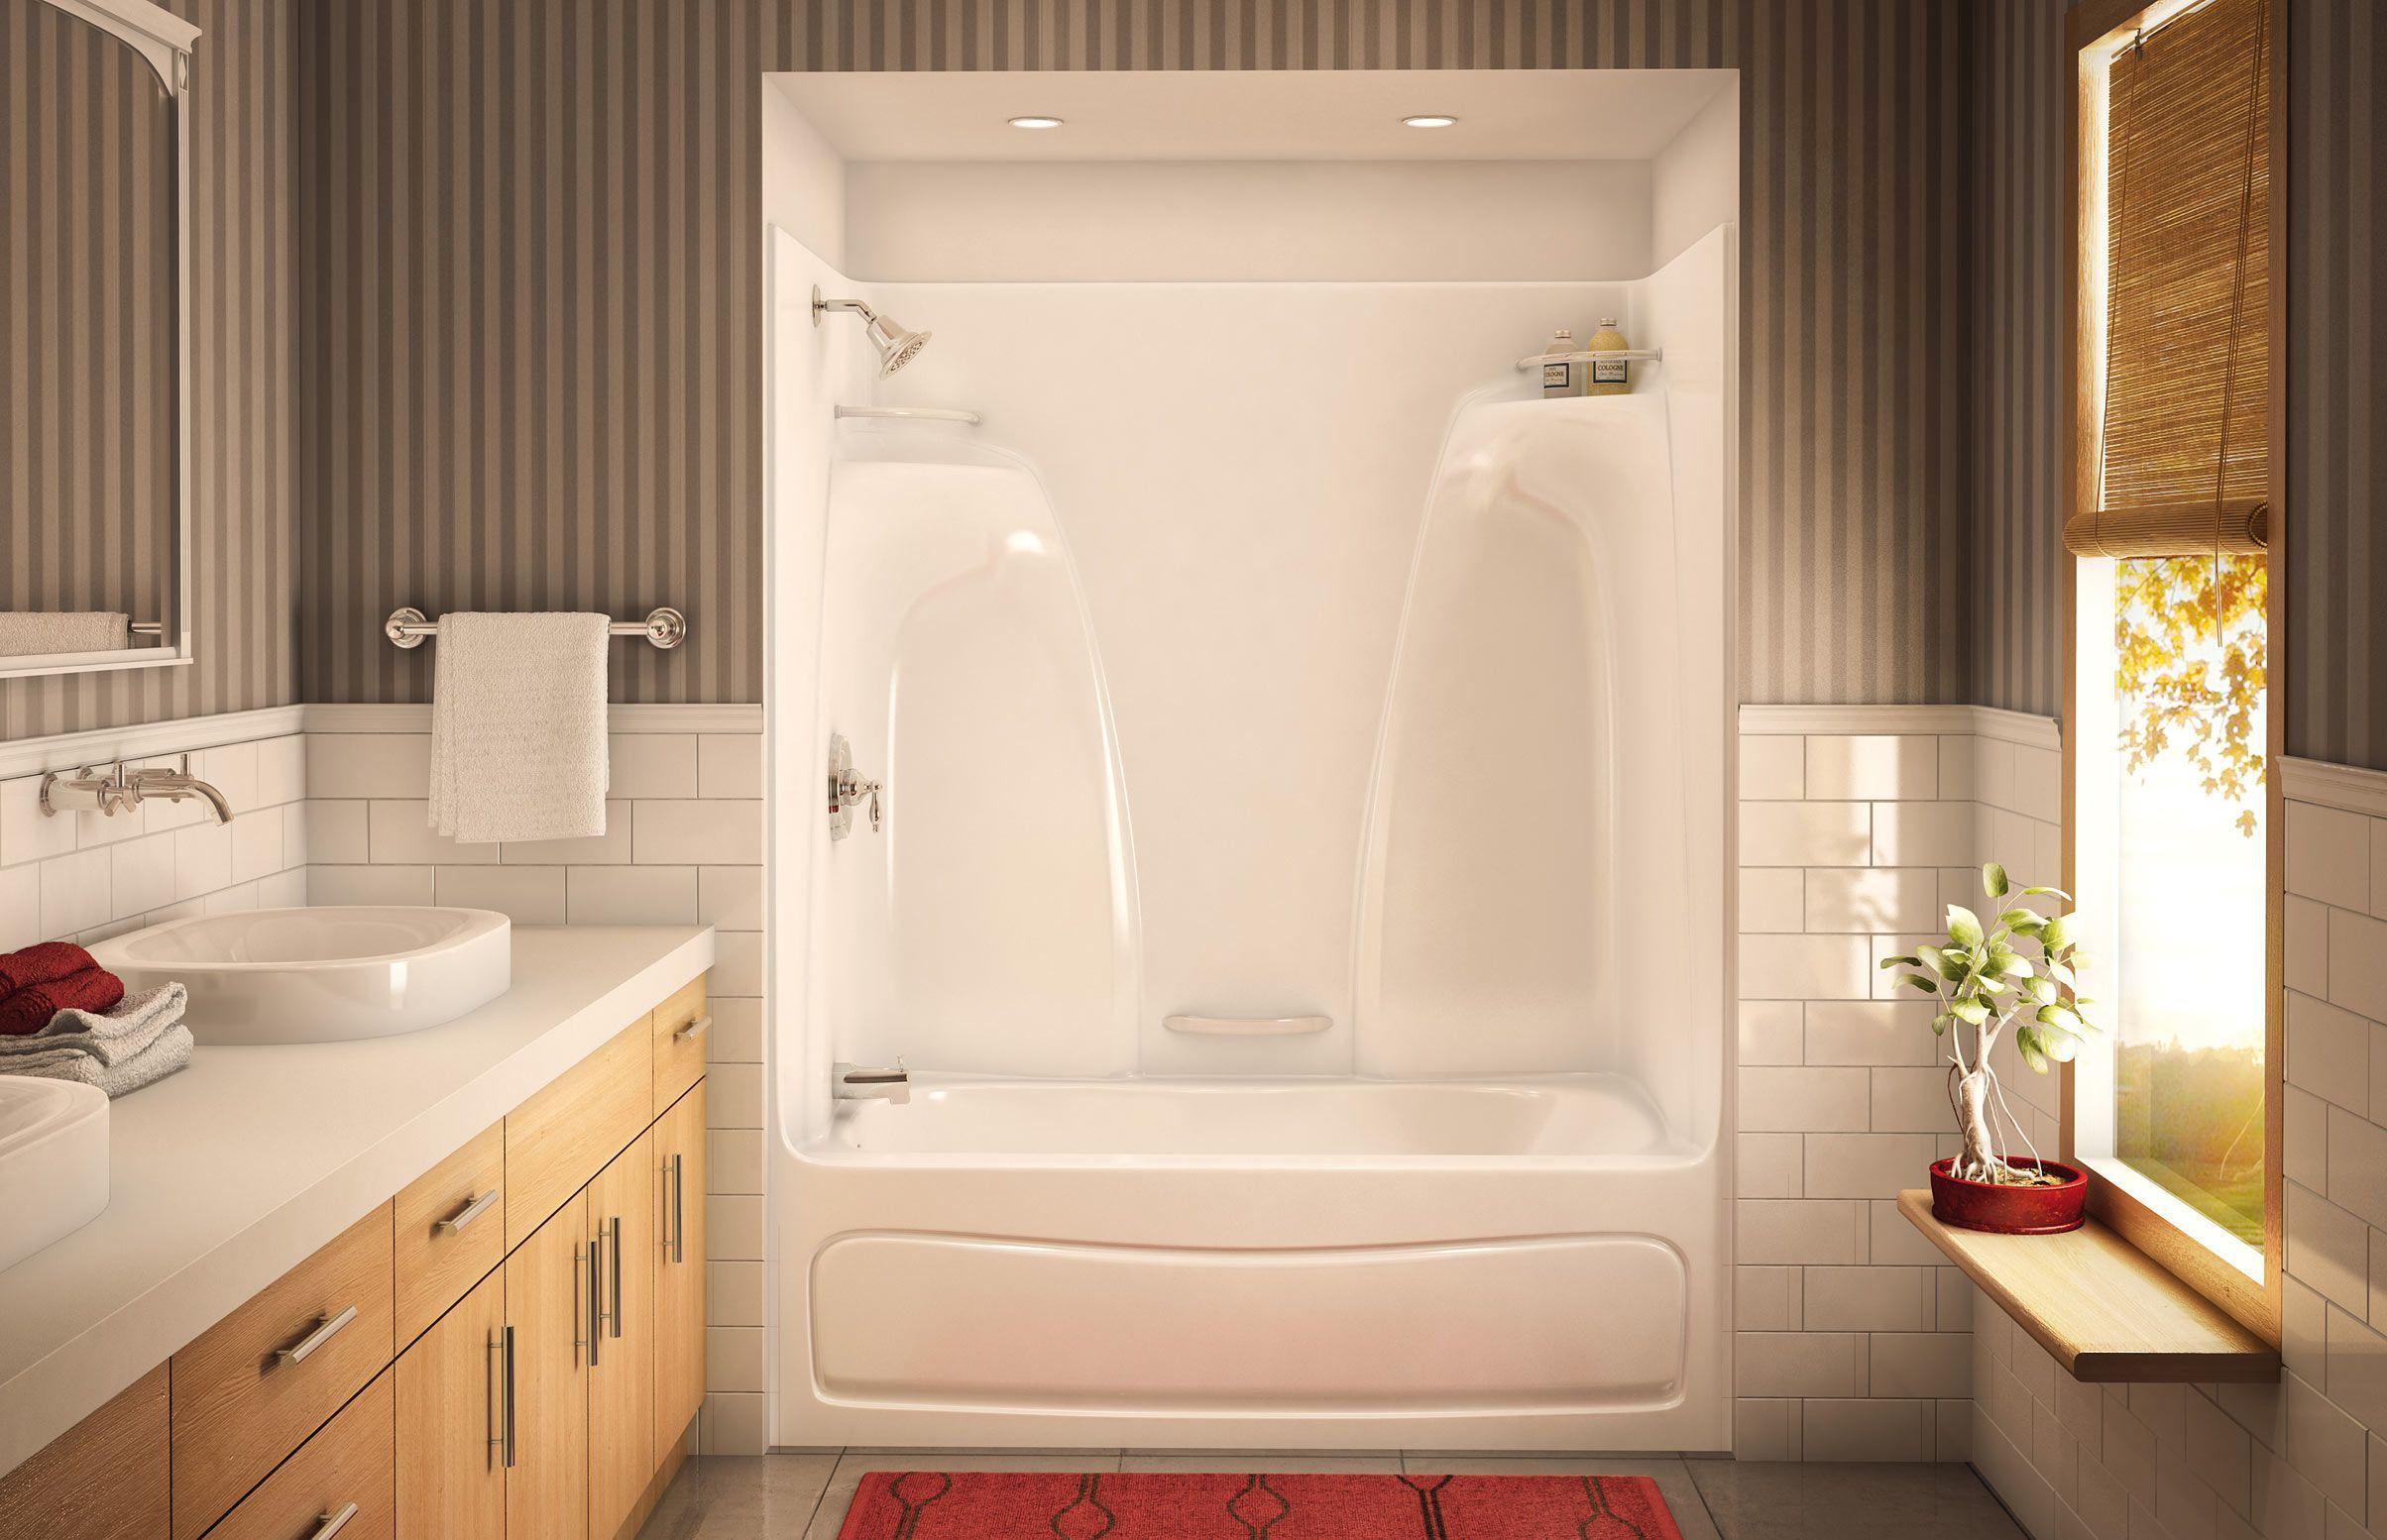 Abigails tub   Bathroom remodel   Pinterest